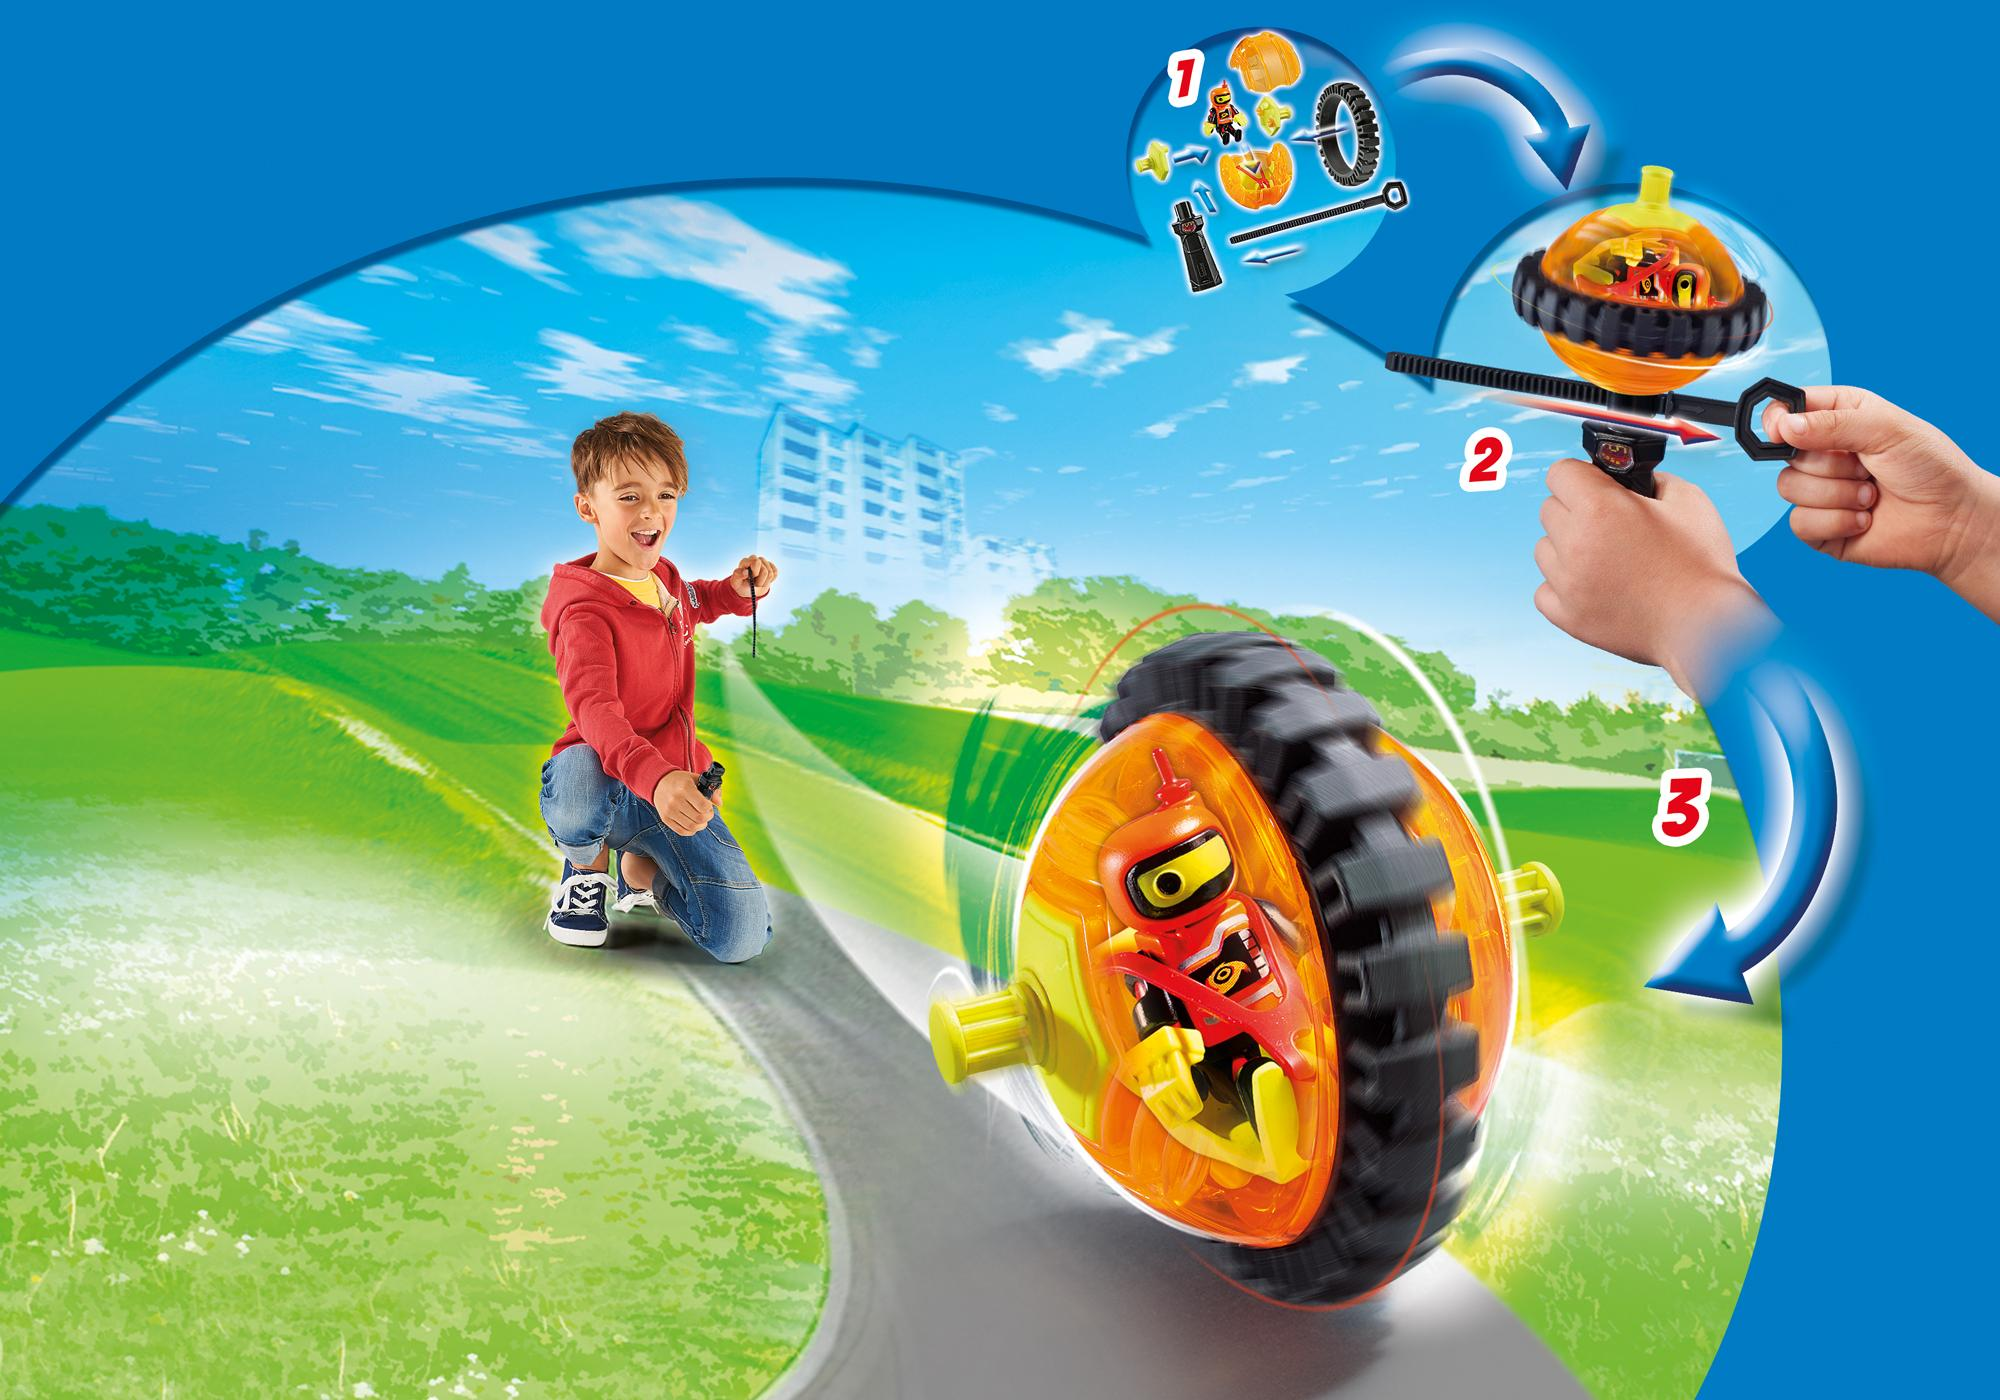 http://media.playmobil.com/i/playmobil/9203_product_extra1/Speed Roller arancio con robot